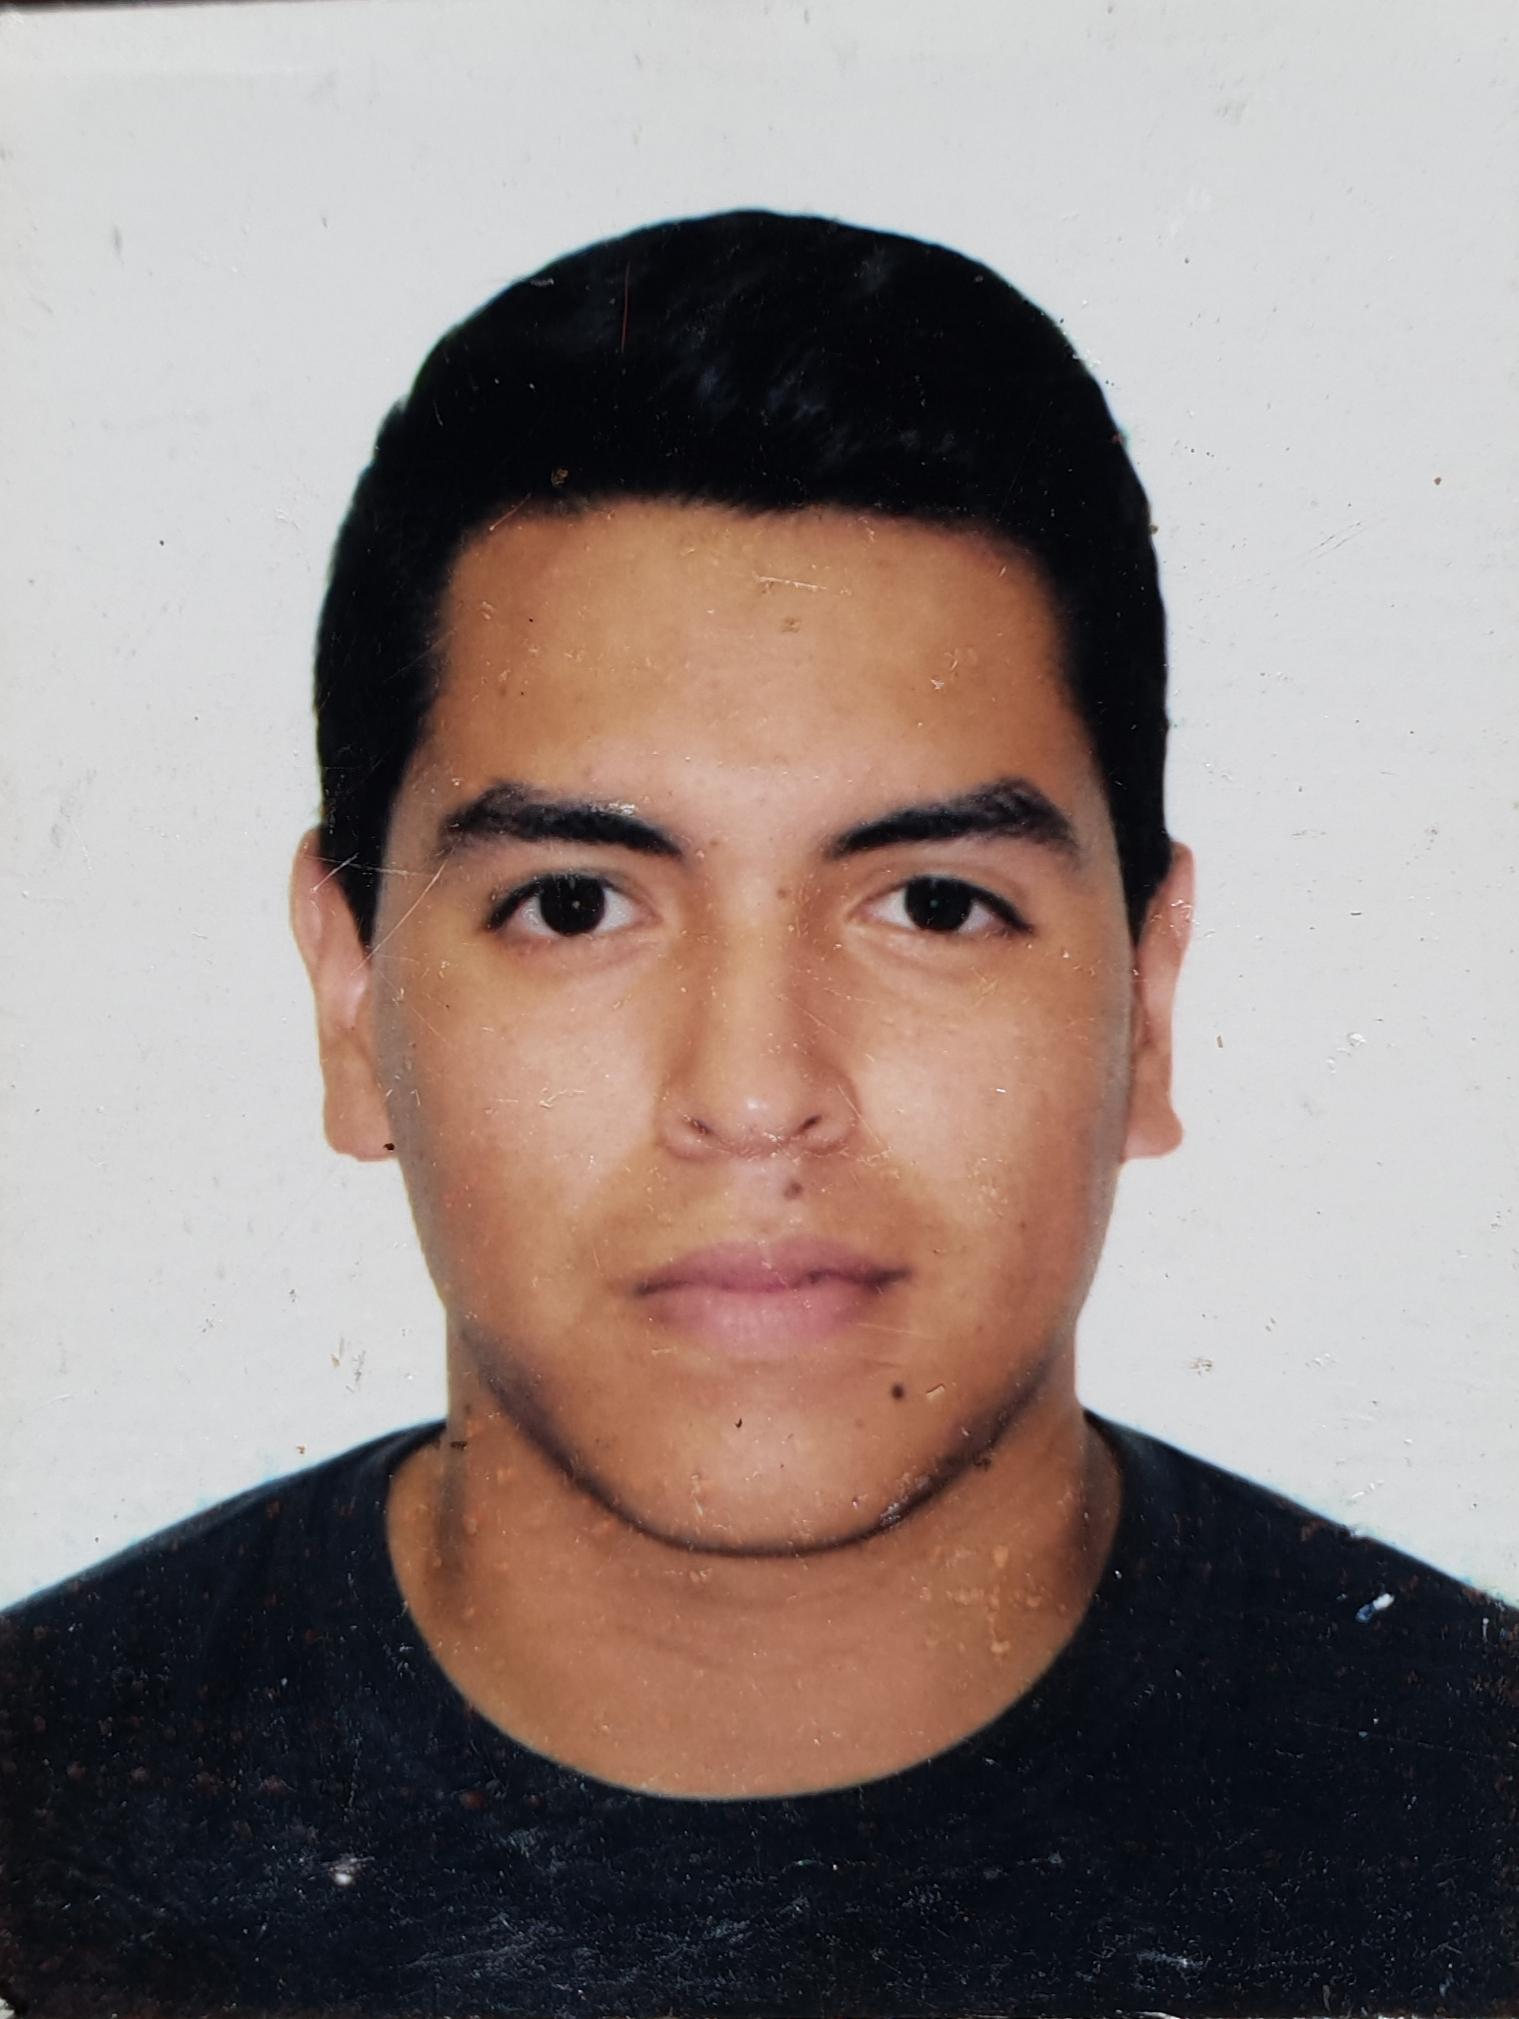 Cristian Borja